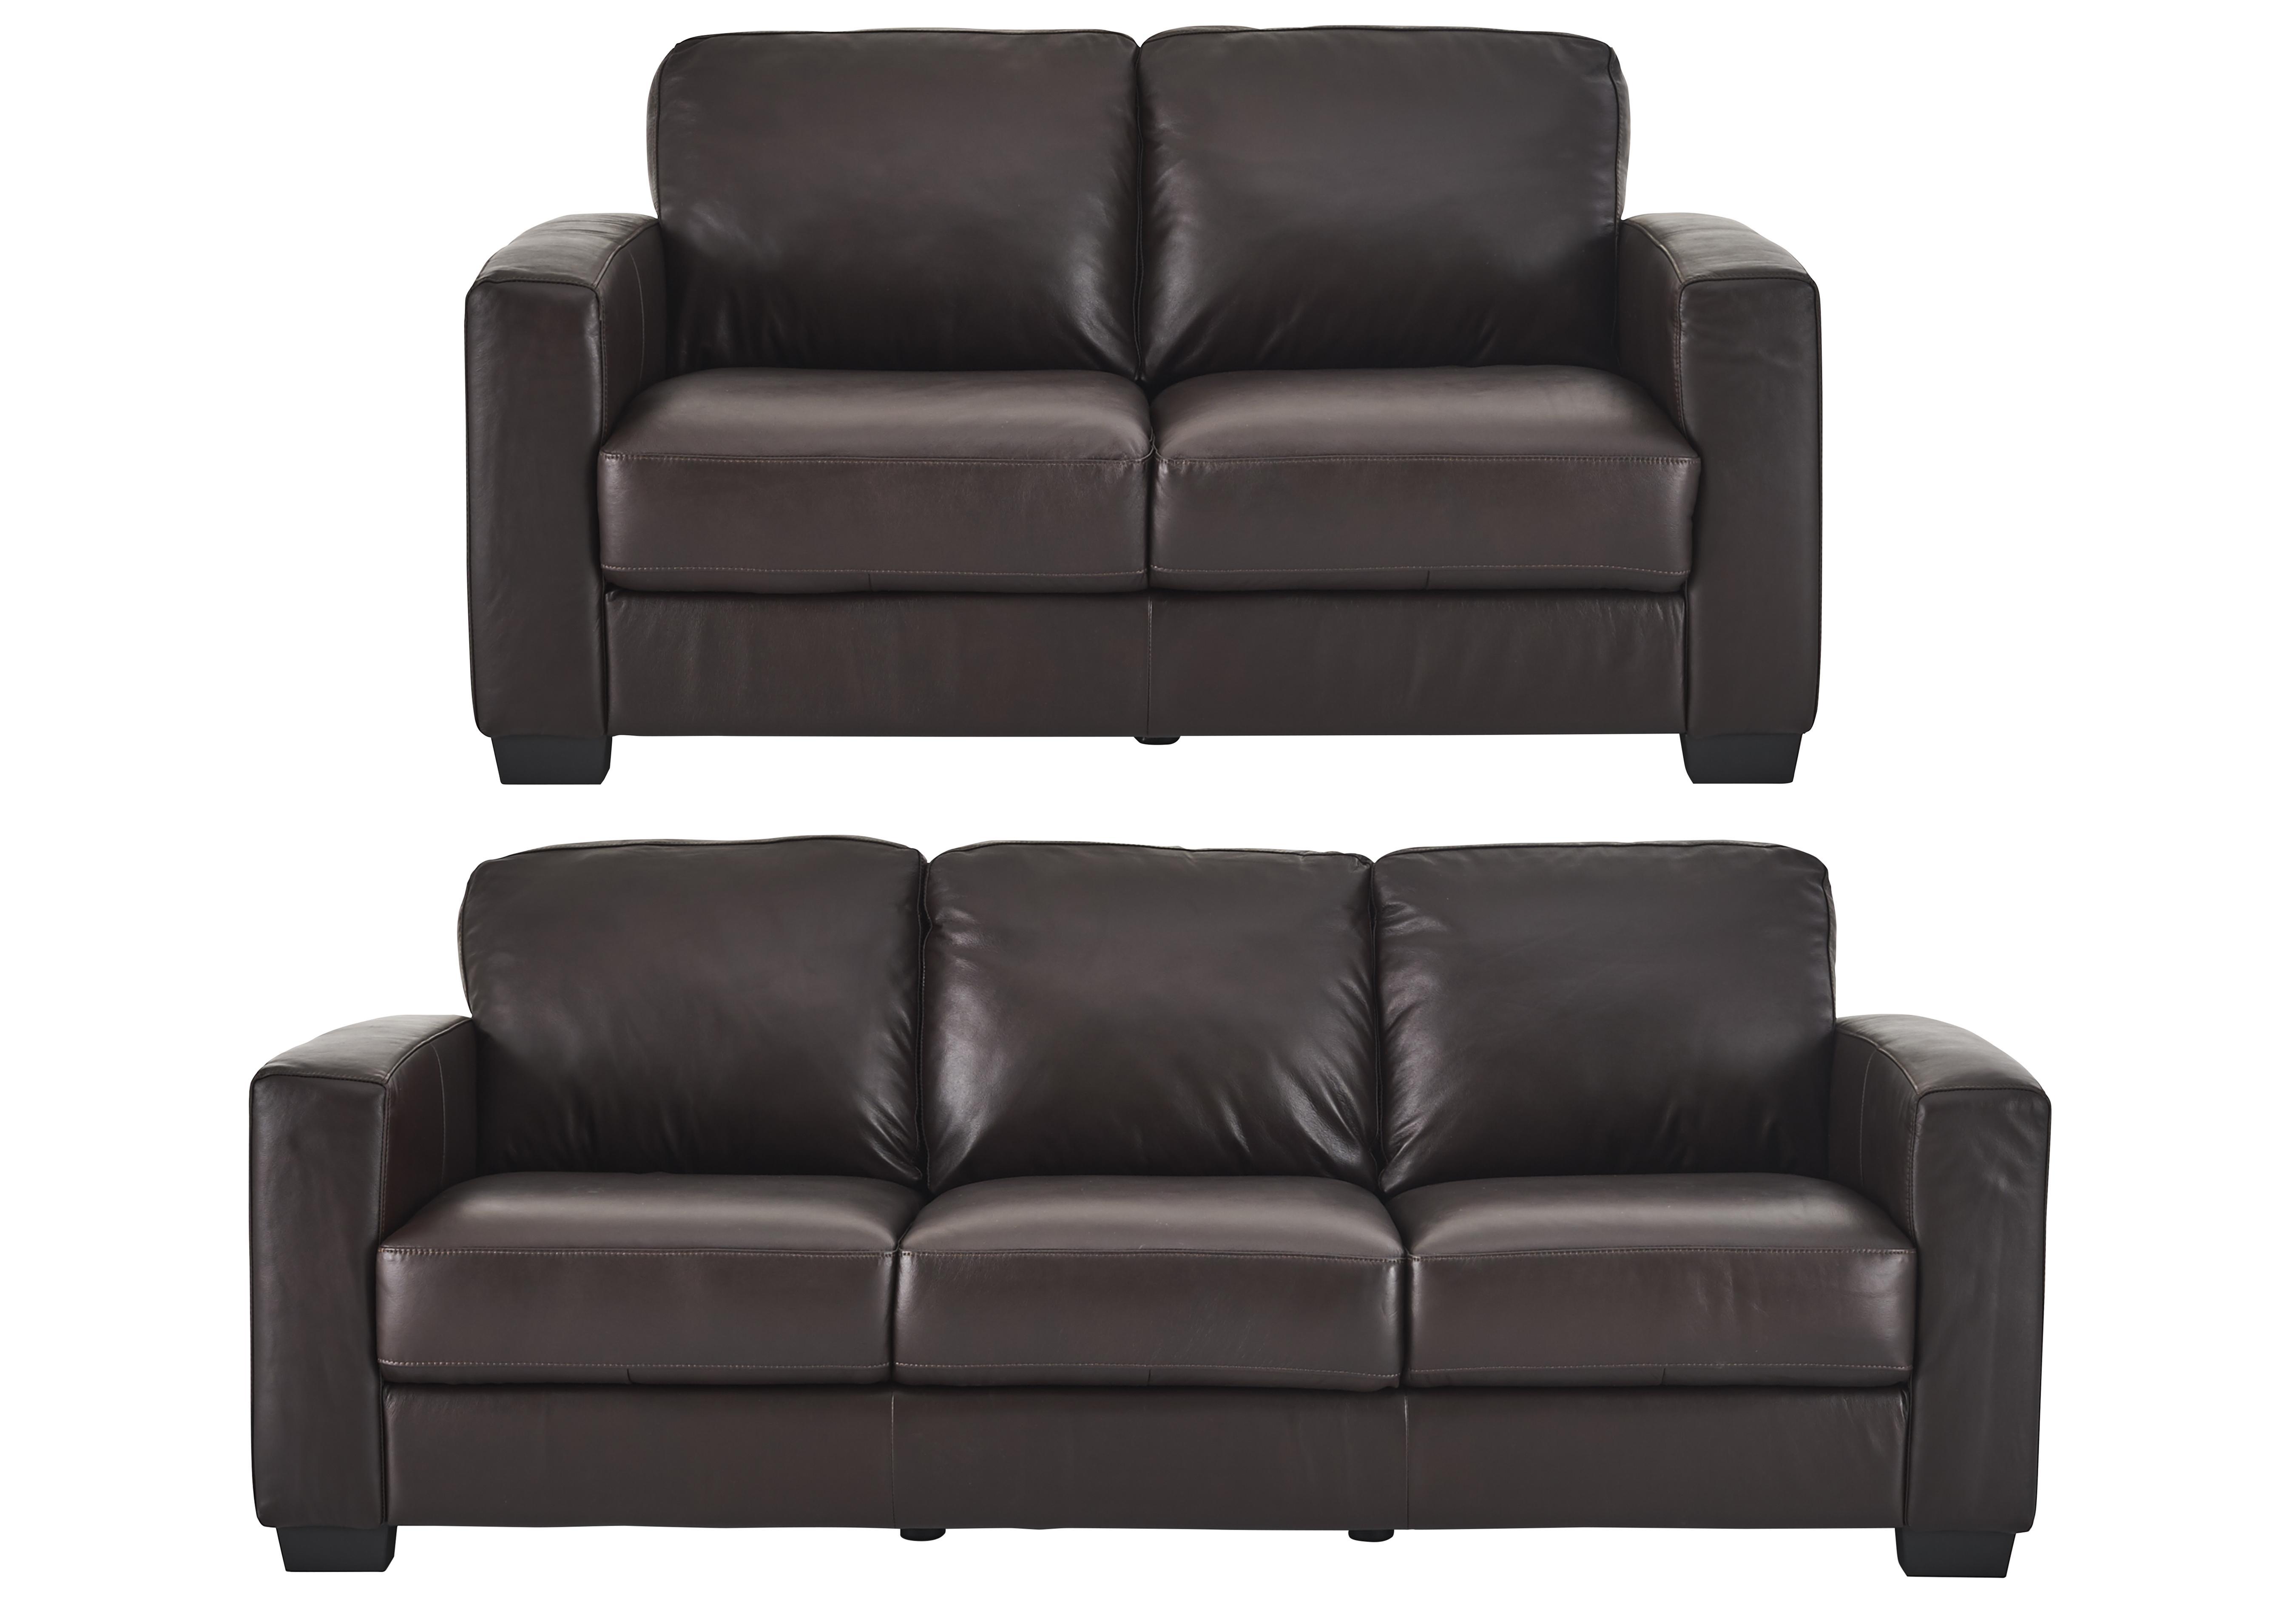 Dante 3 2 Seater Leather Sofas Furniture Village